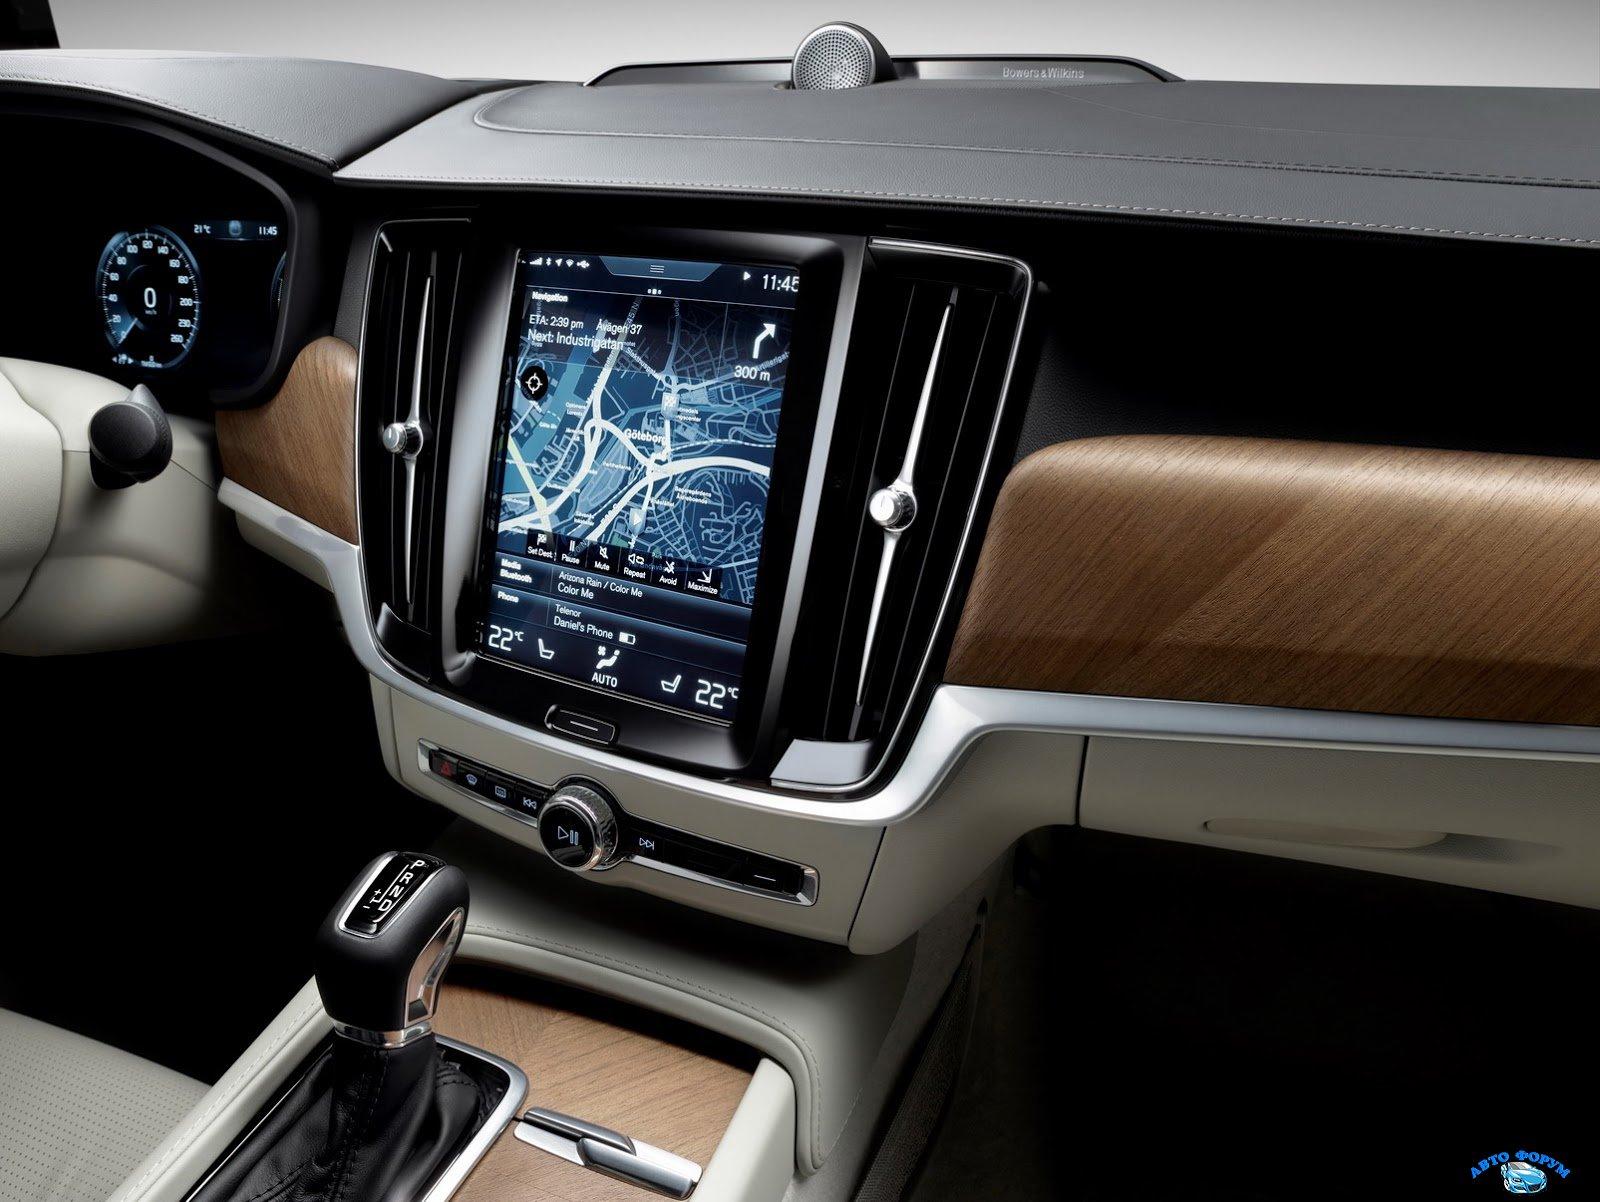 interior-comp-merc-jag-volvo-s90-5.jpg